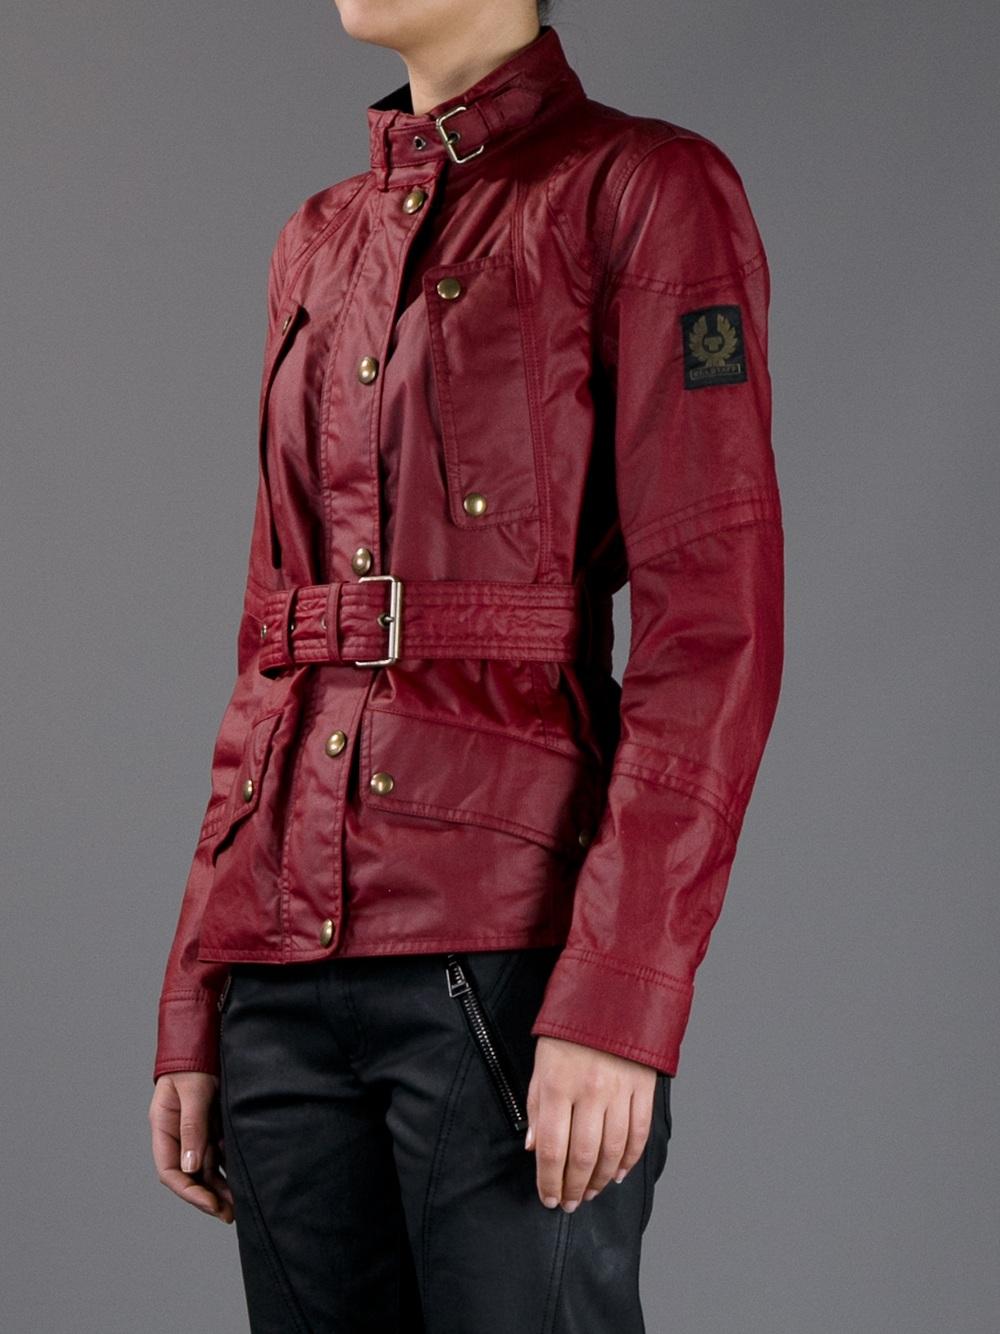 Belstaff Red Jacket